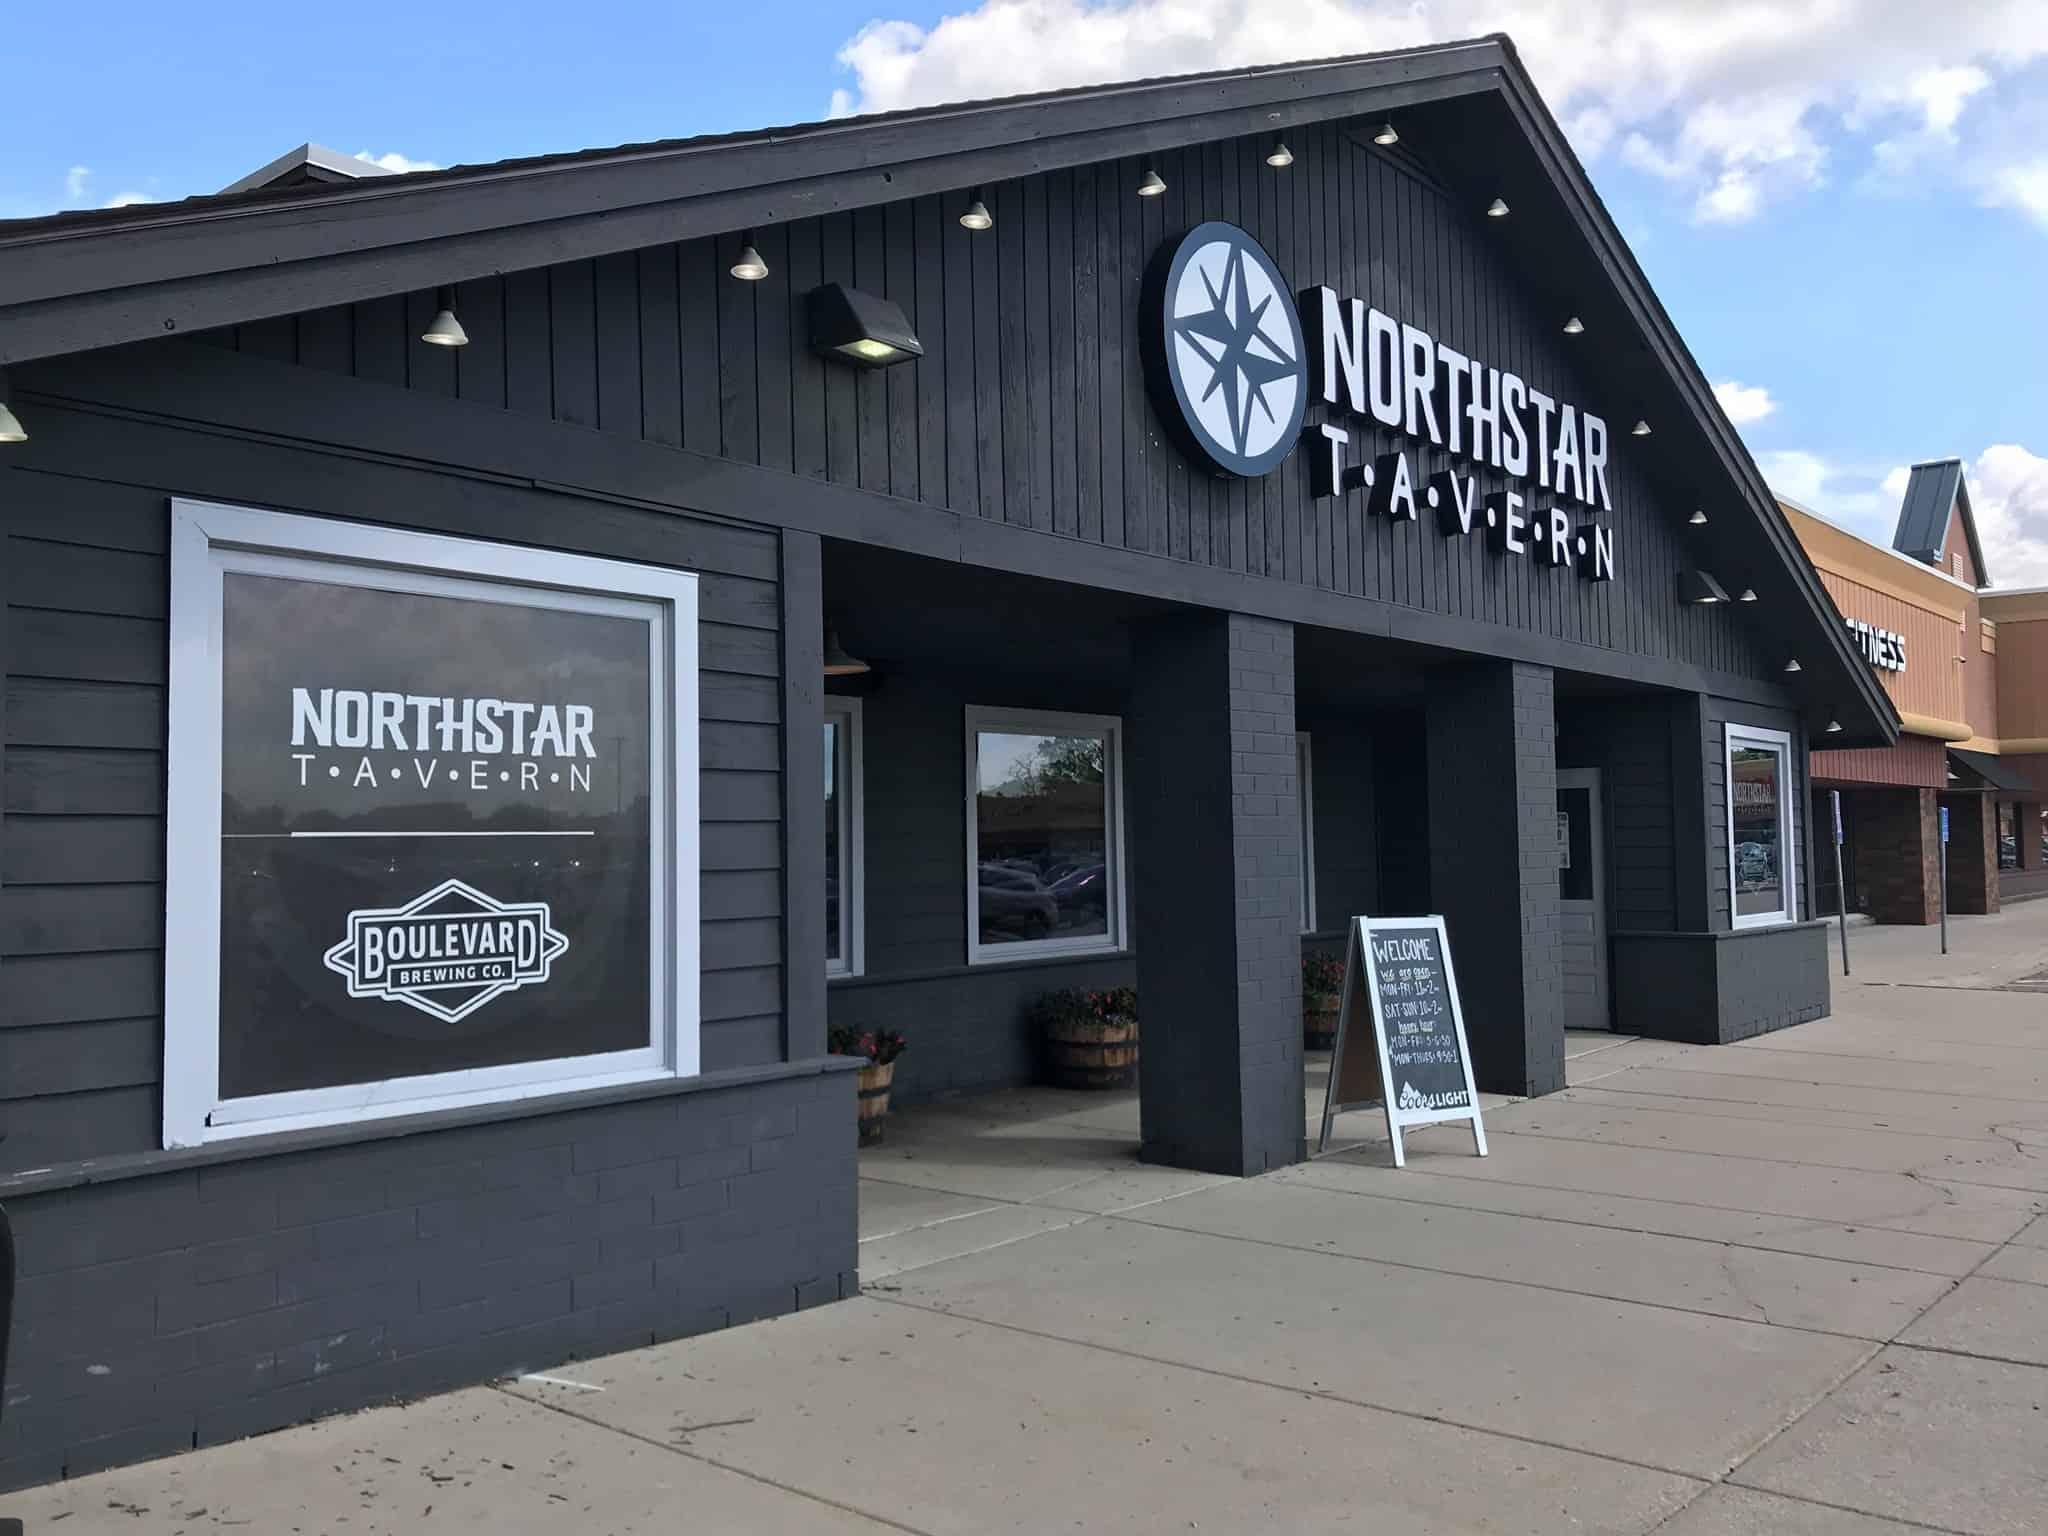 NorthStar Tavern